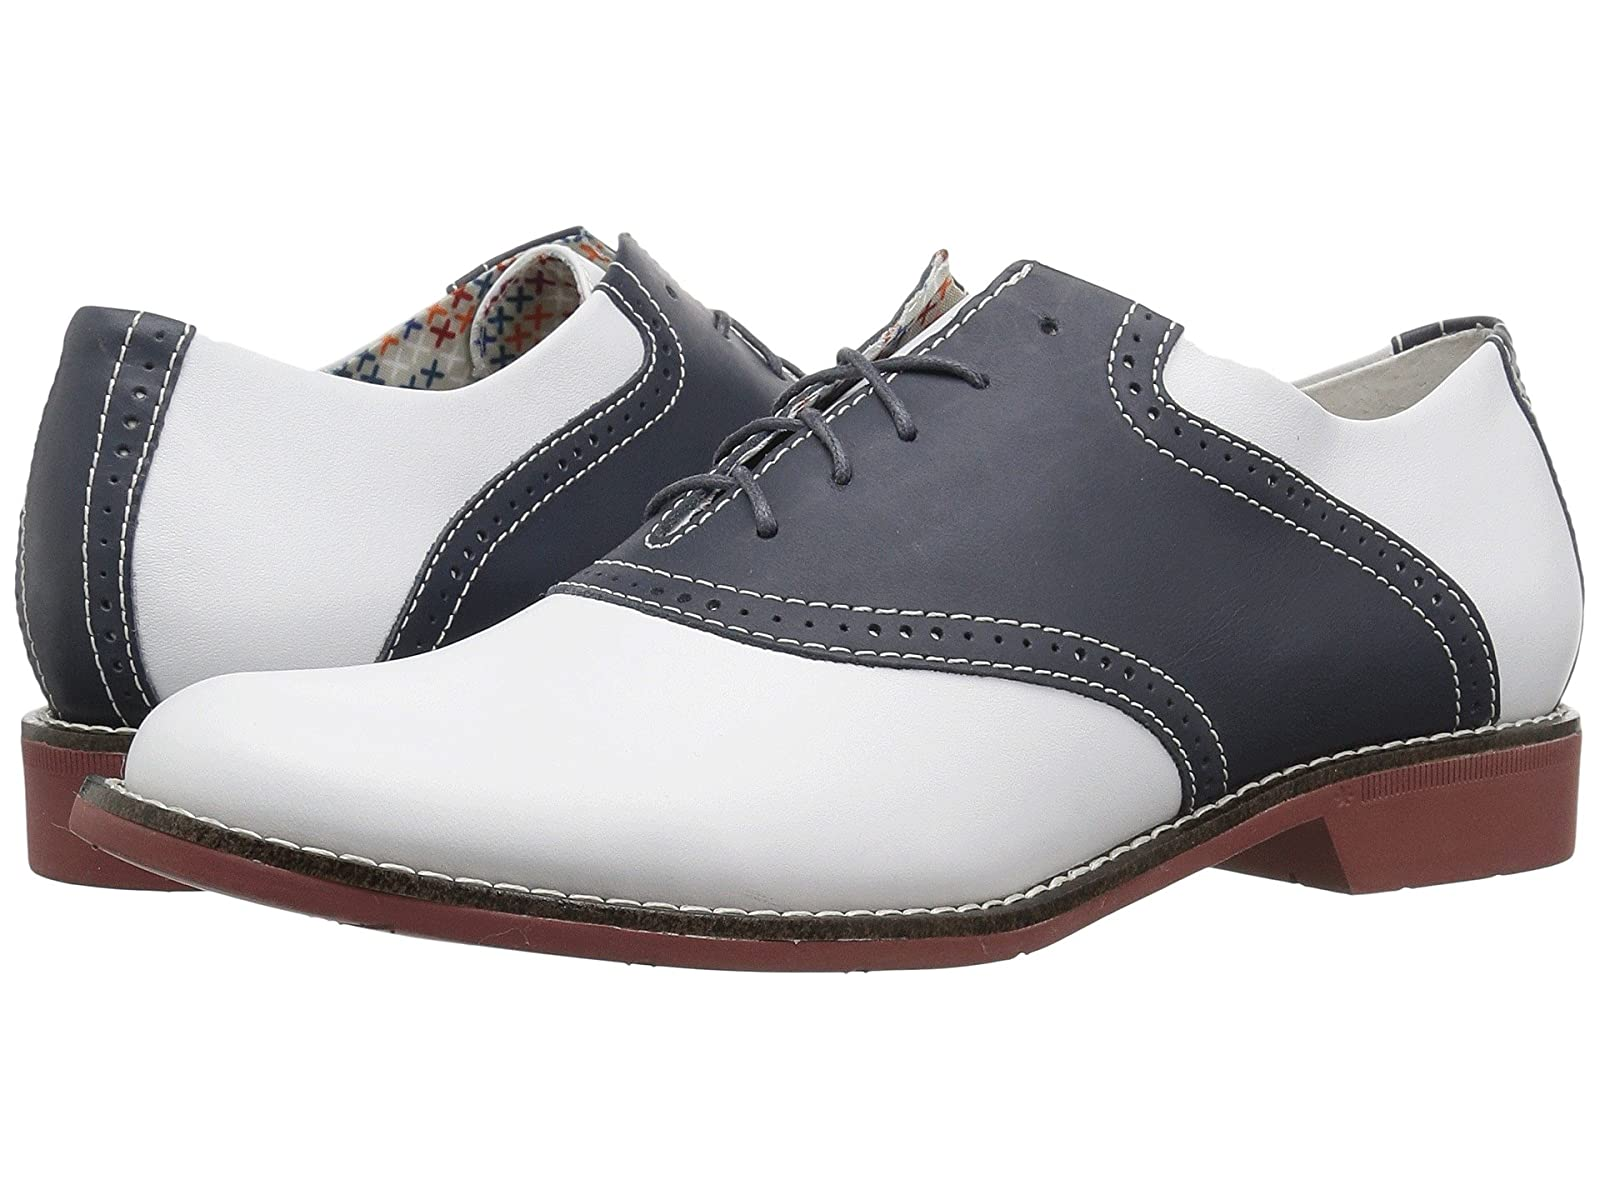 G.H. Bass & Co. DoraCheap and distinctive eye-catching shoes